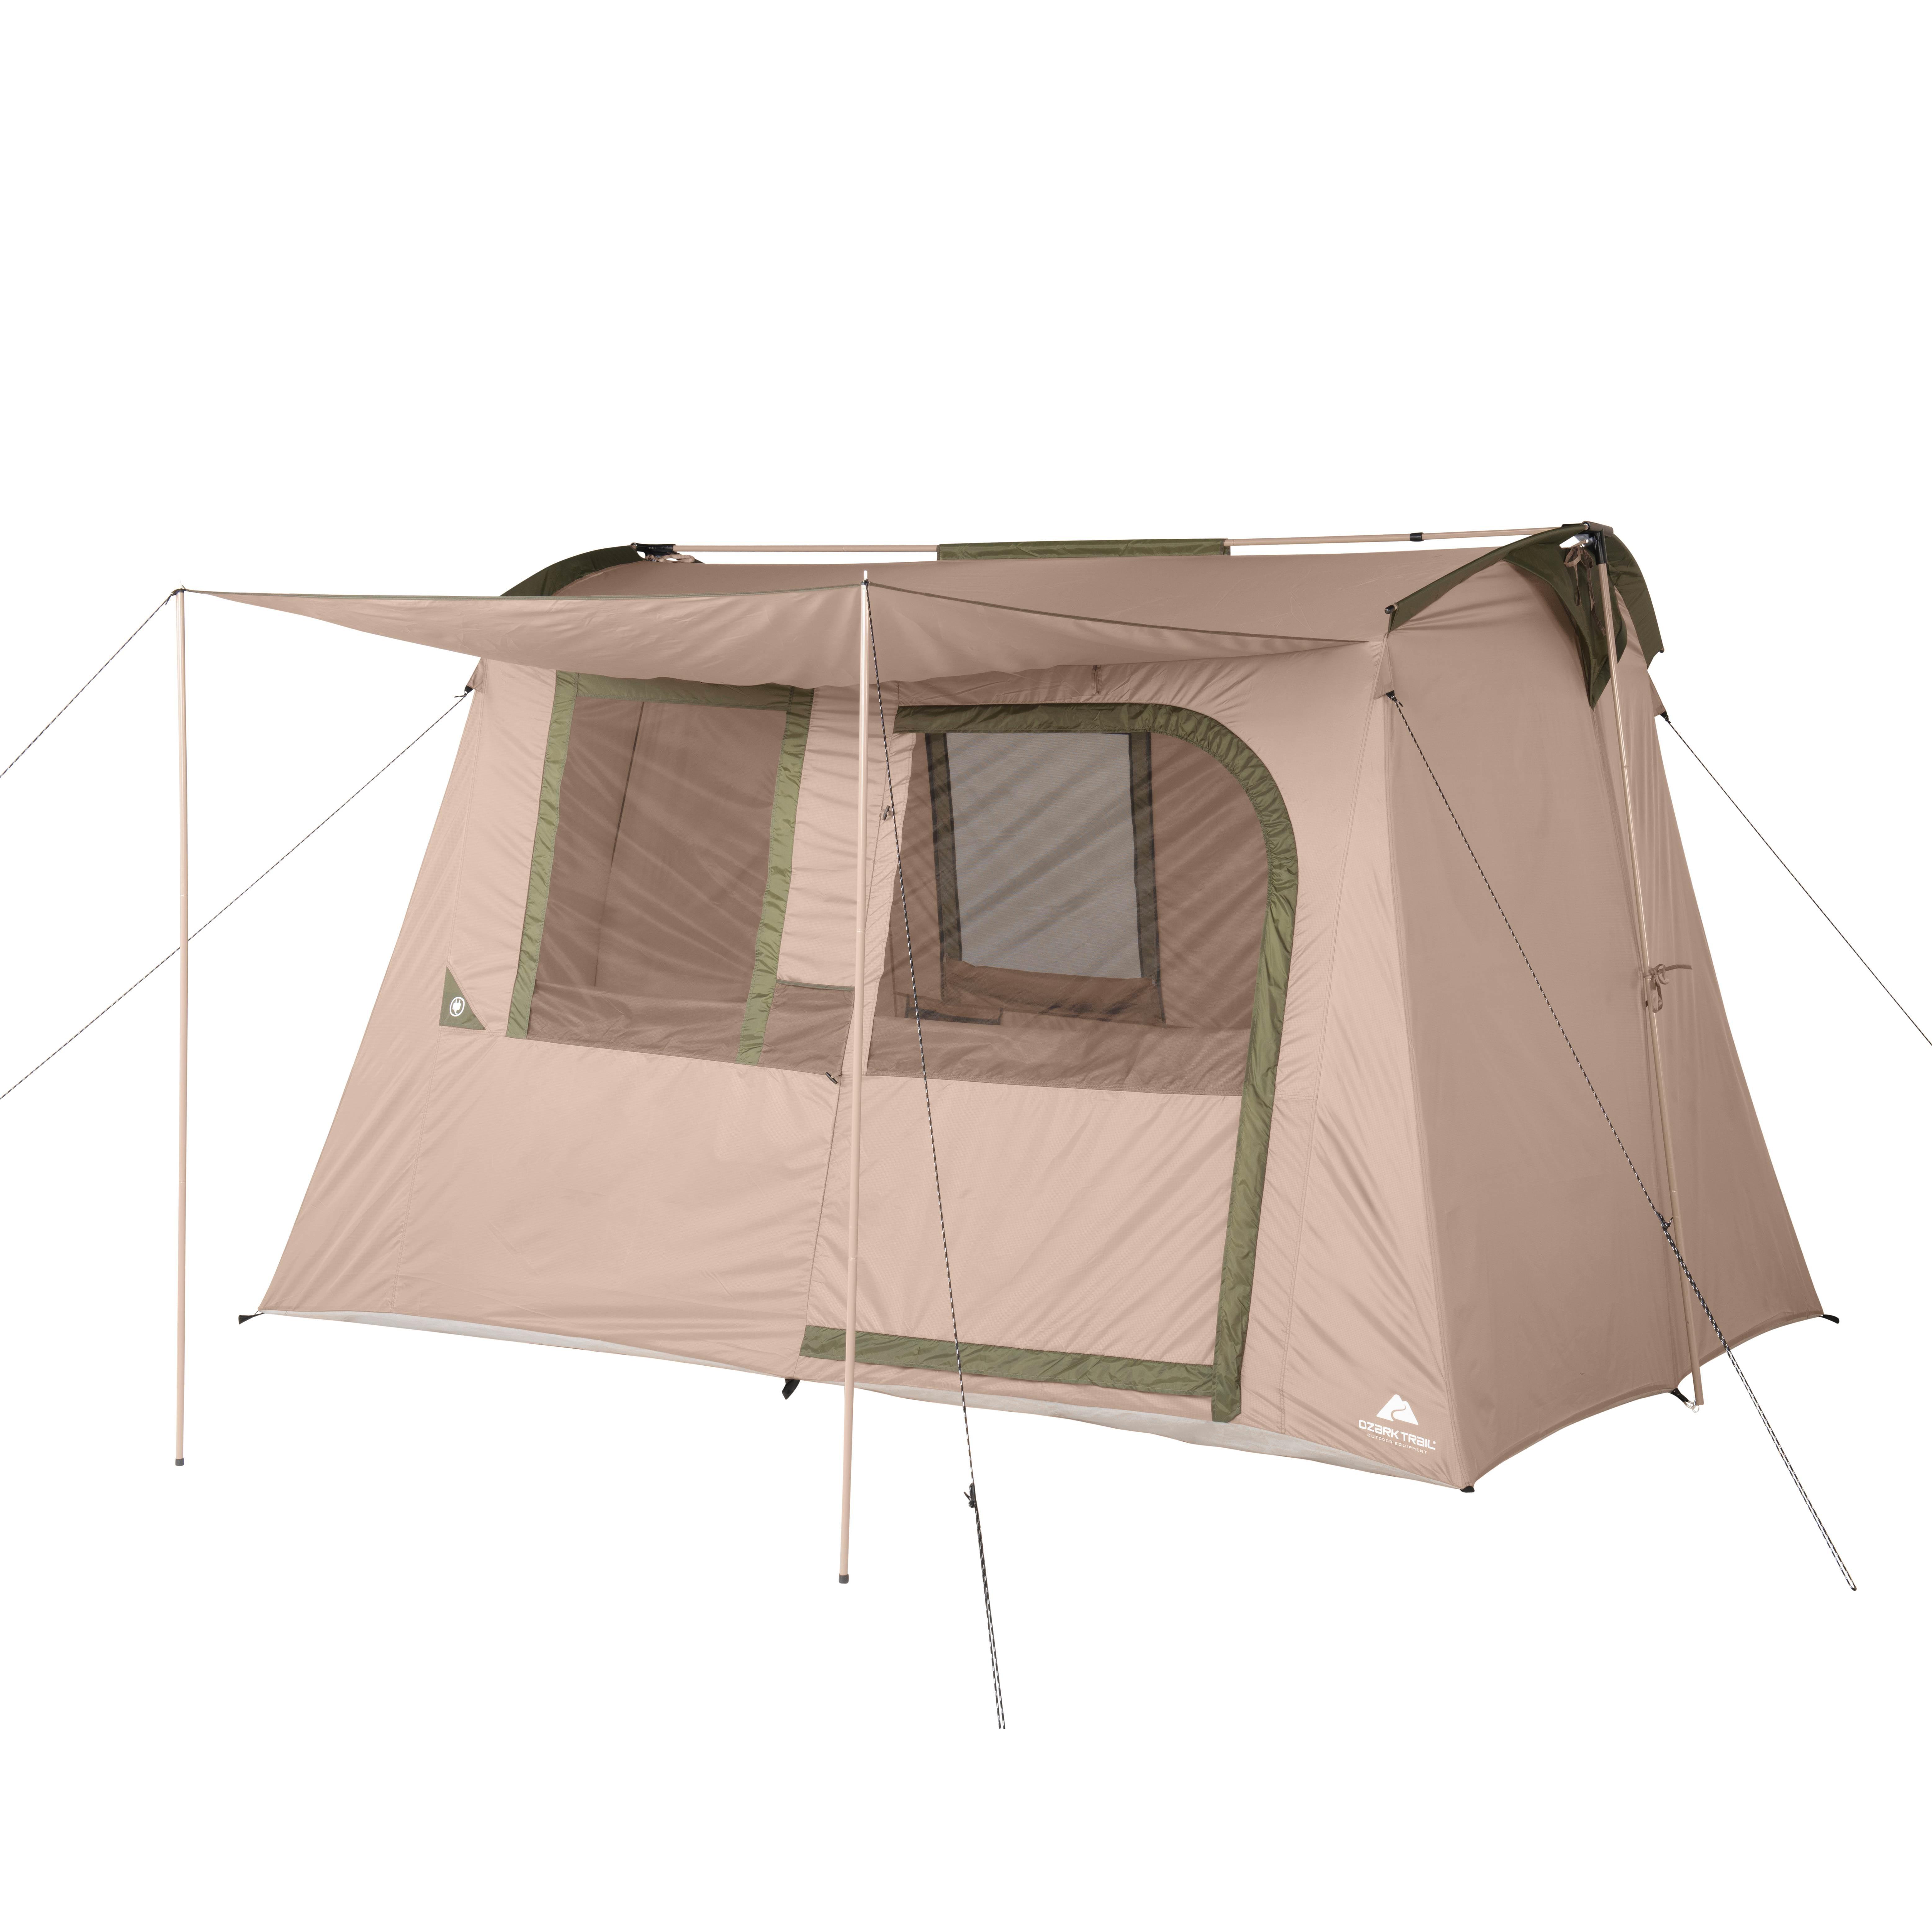 Ozark Trail 6-Person Flex Ridge Camping Tent - Walmart.com ...